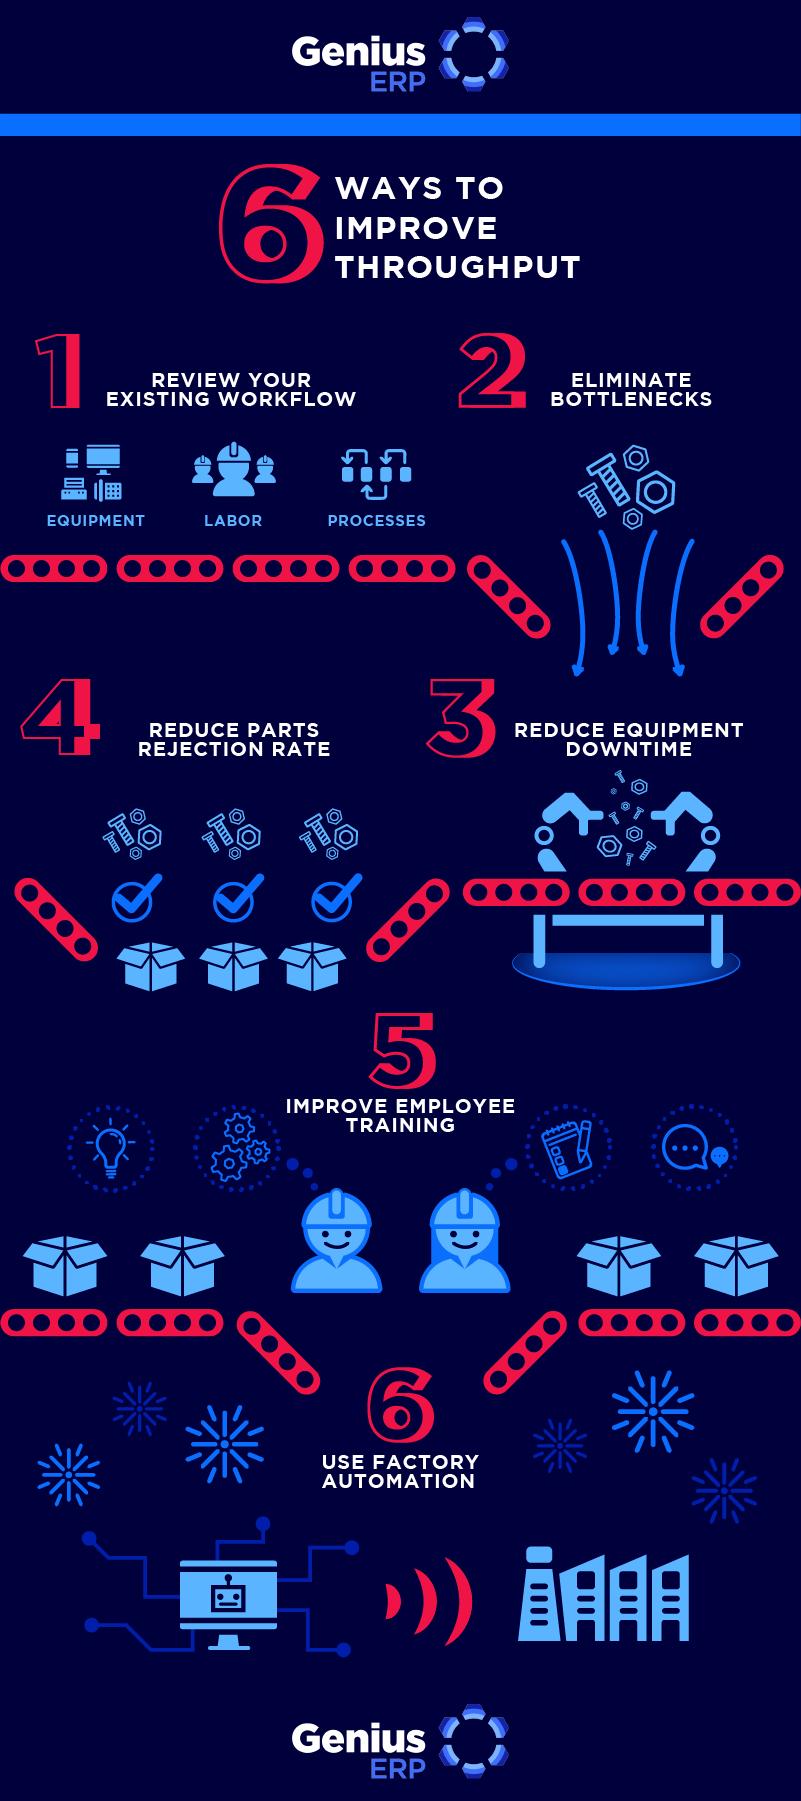 6 Ways to Improve Throughput